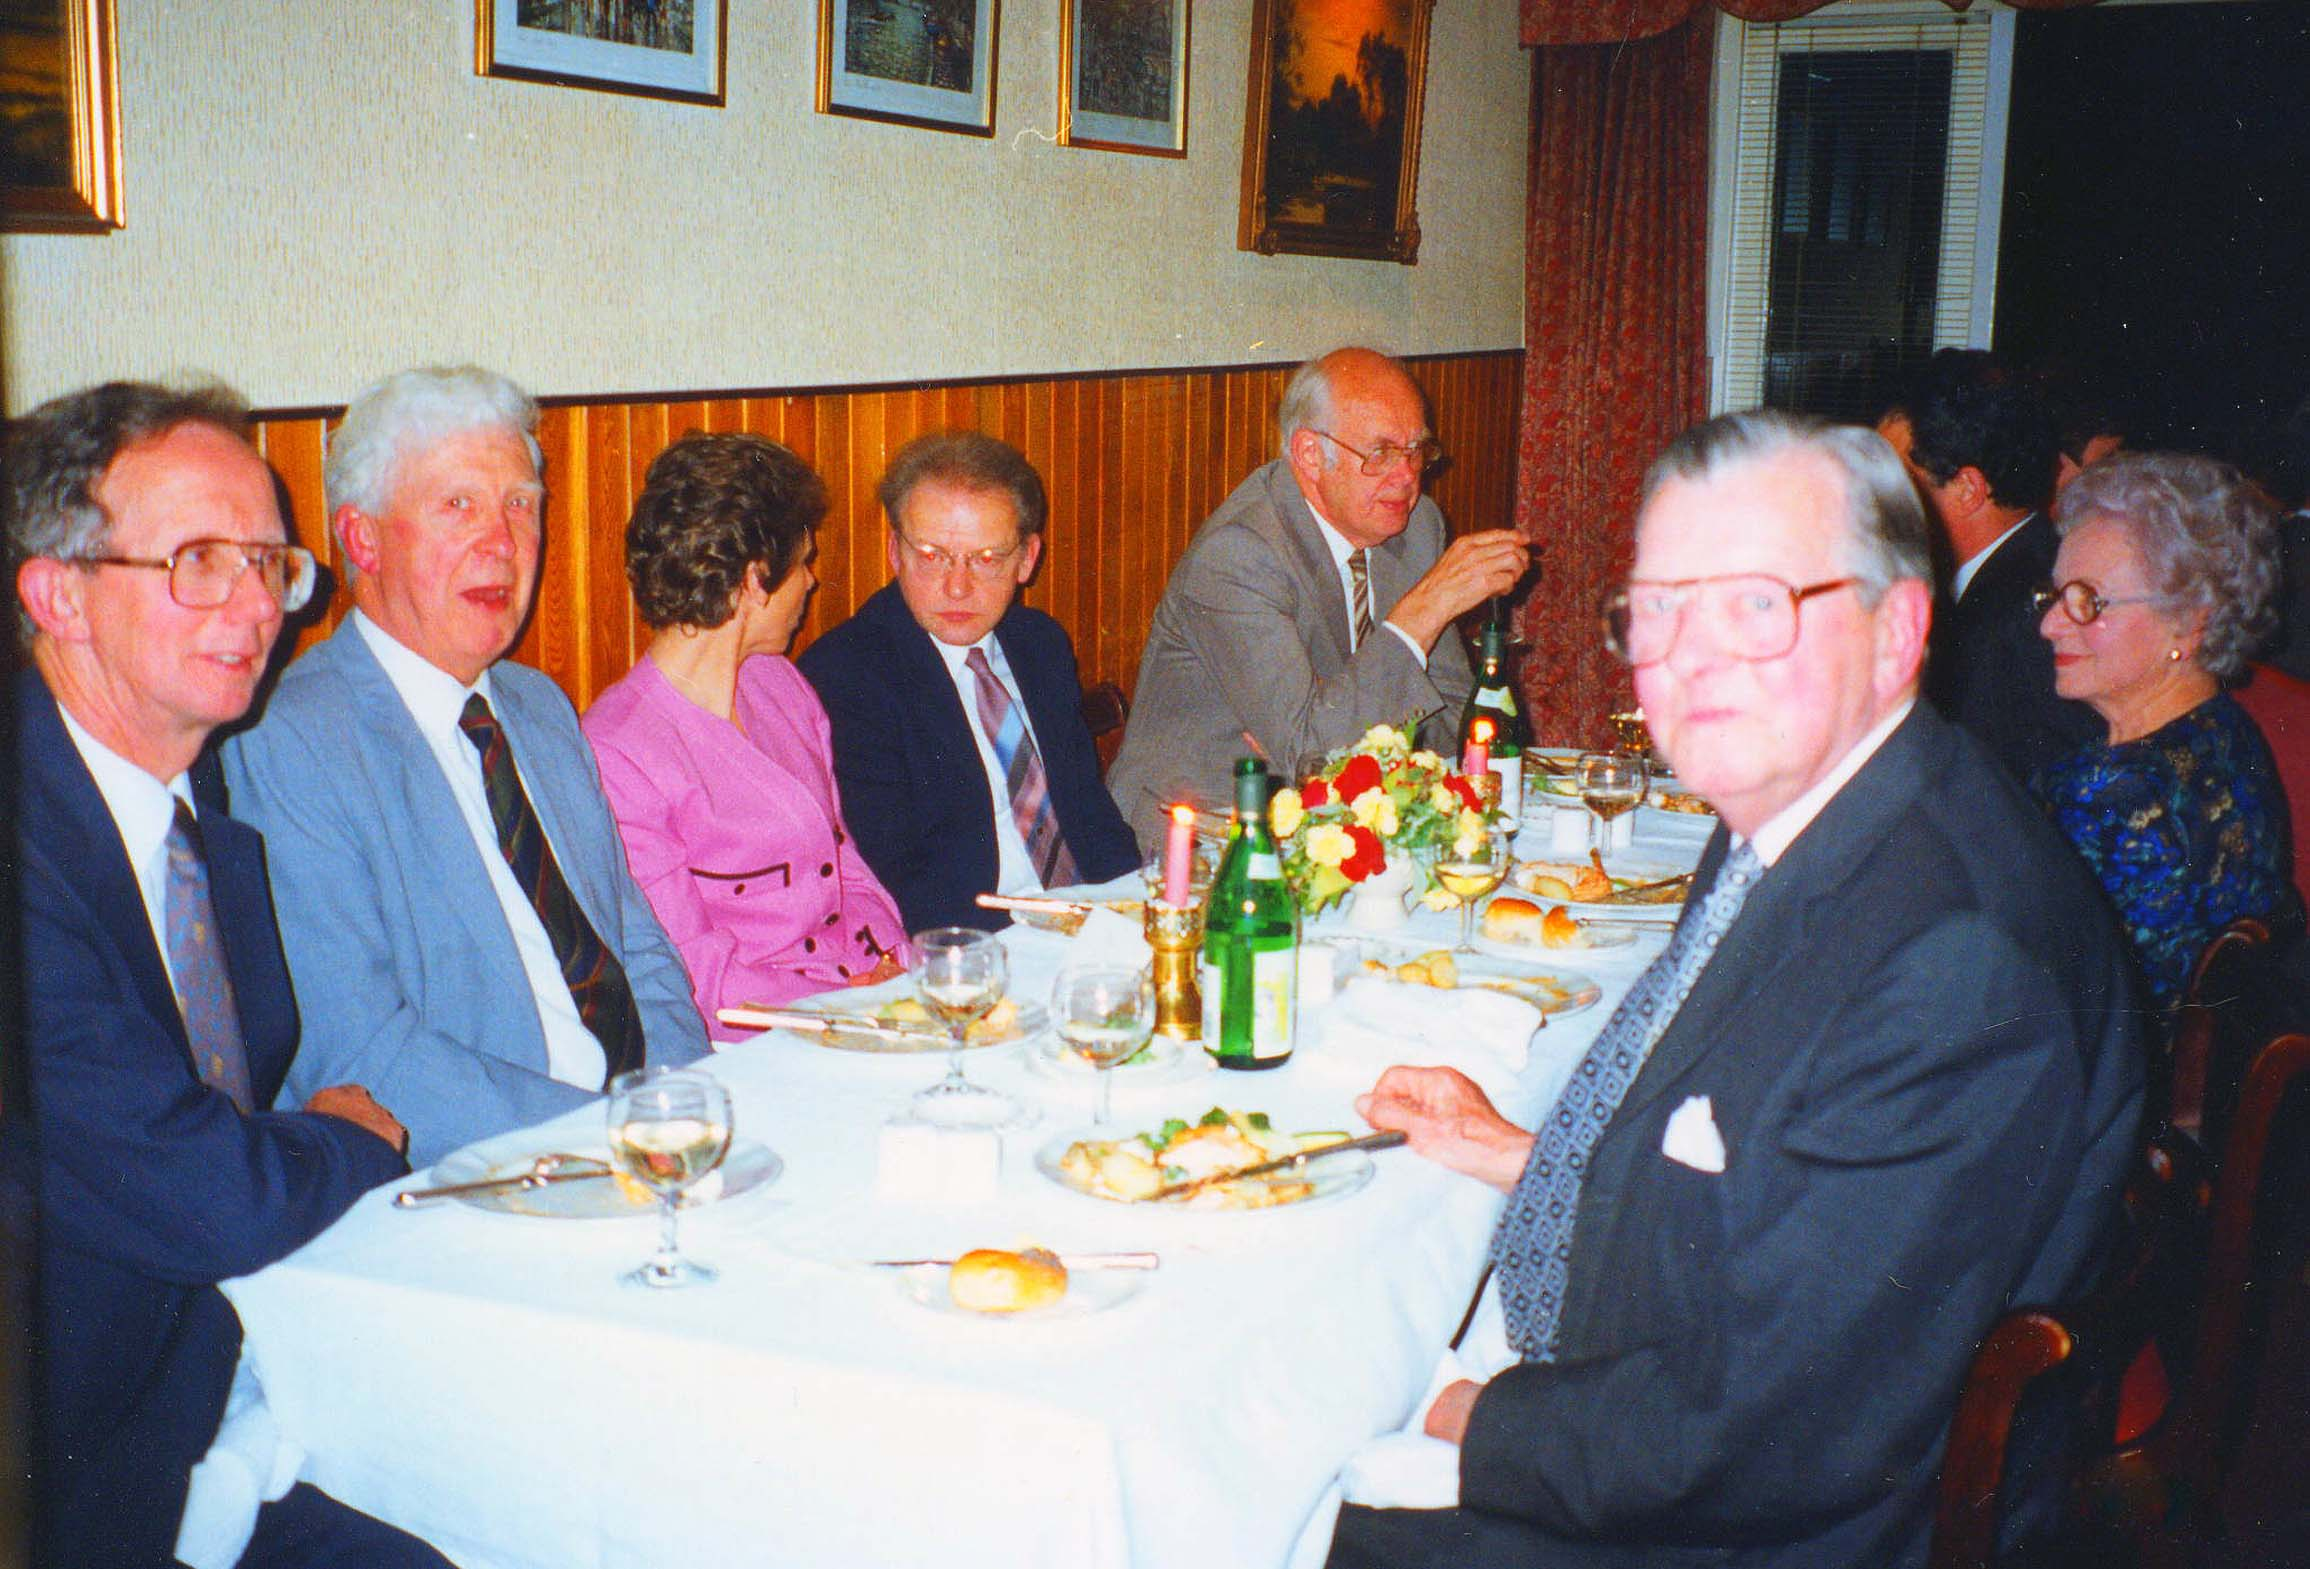 Celebration Meal in 1993